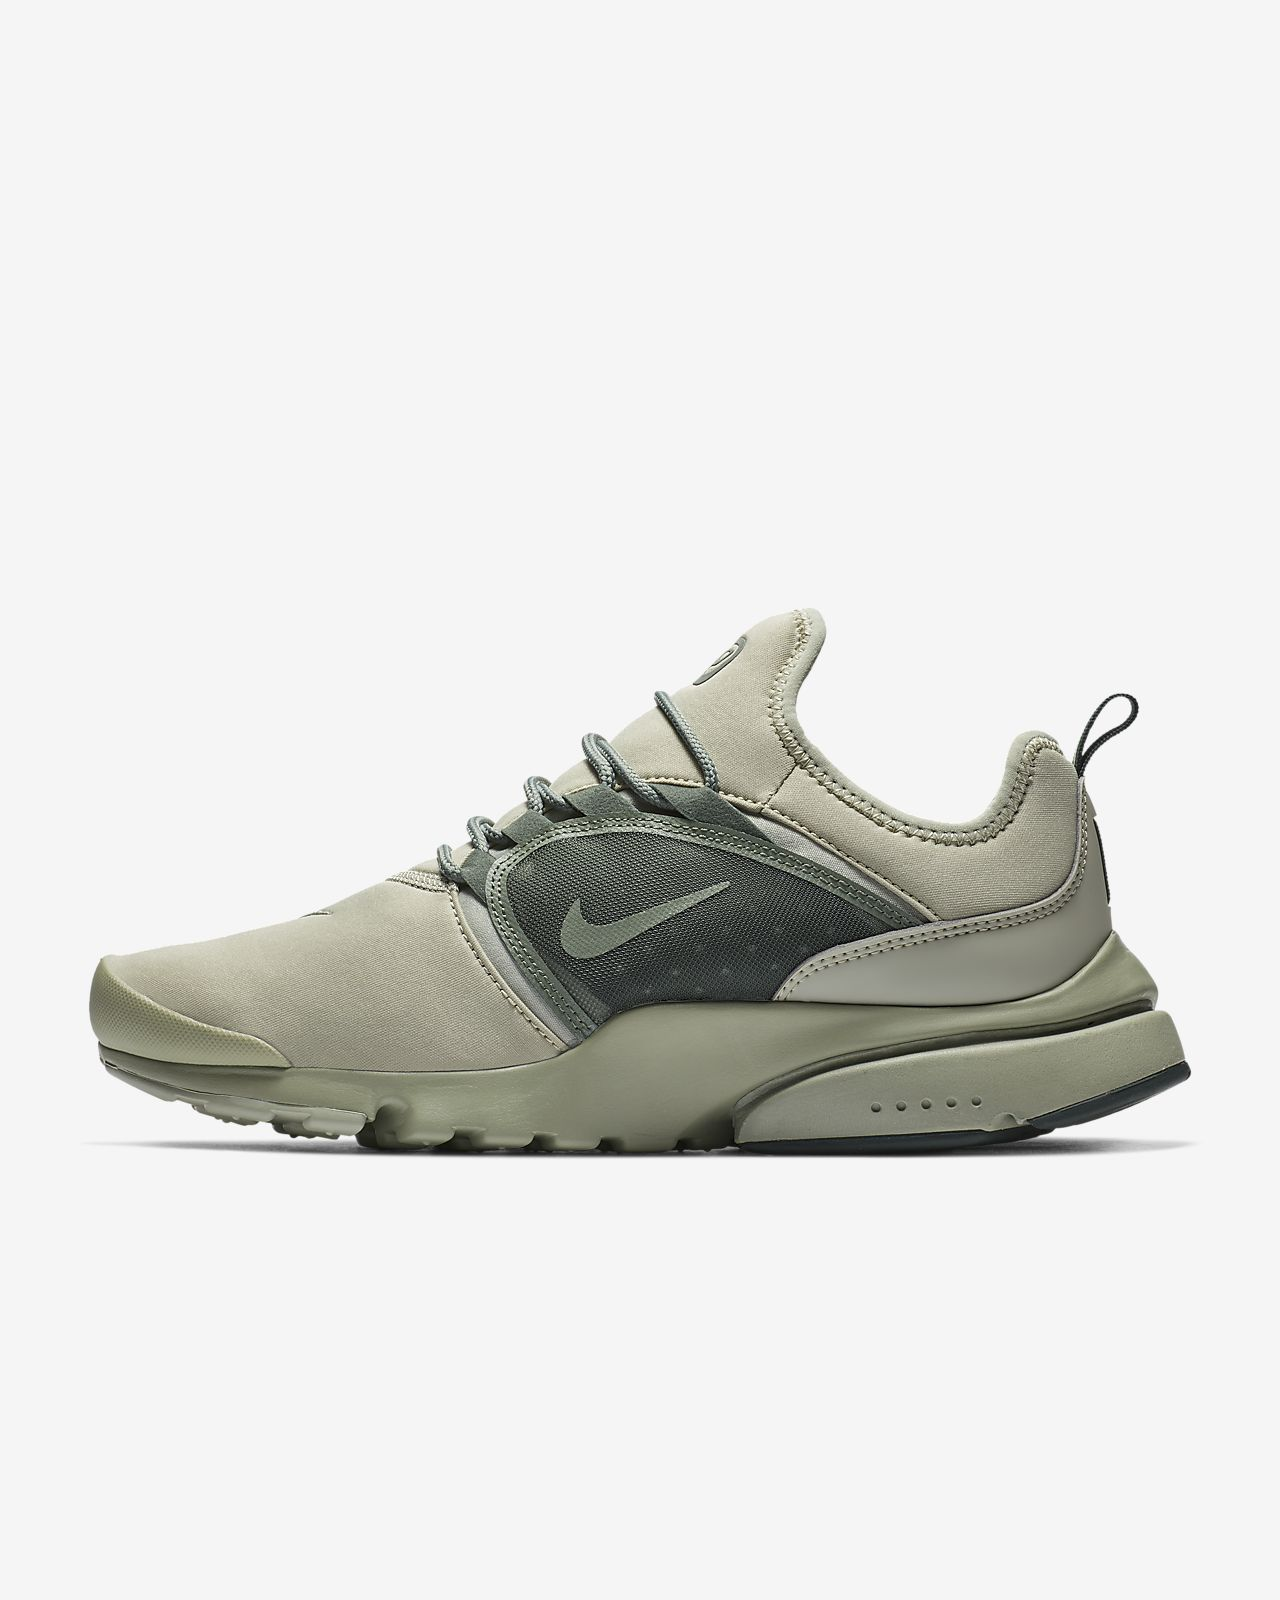 9fcc0a584a76c Nike Presto Fly World Men s Shoe. Nike.com AU